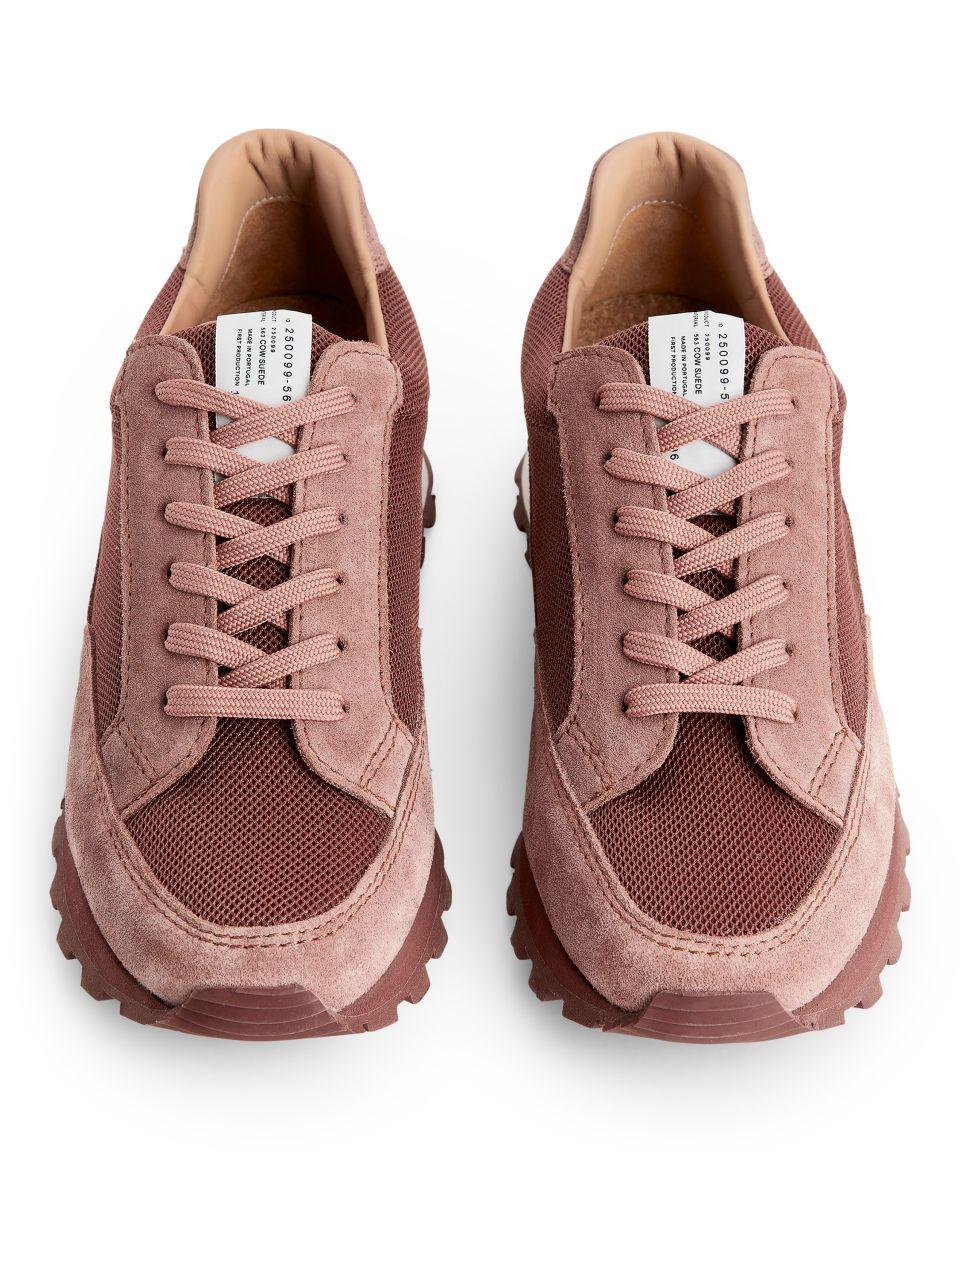 Jogger Low Blush Shoes